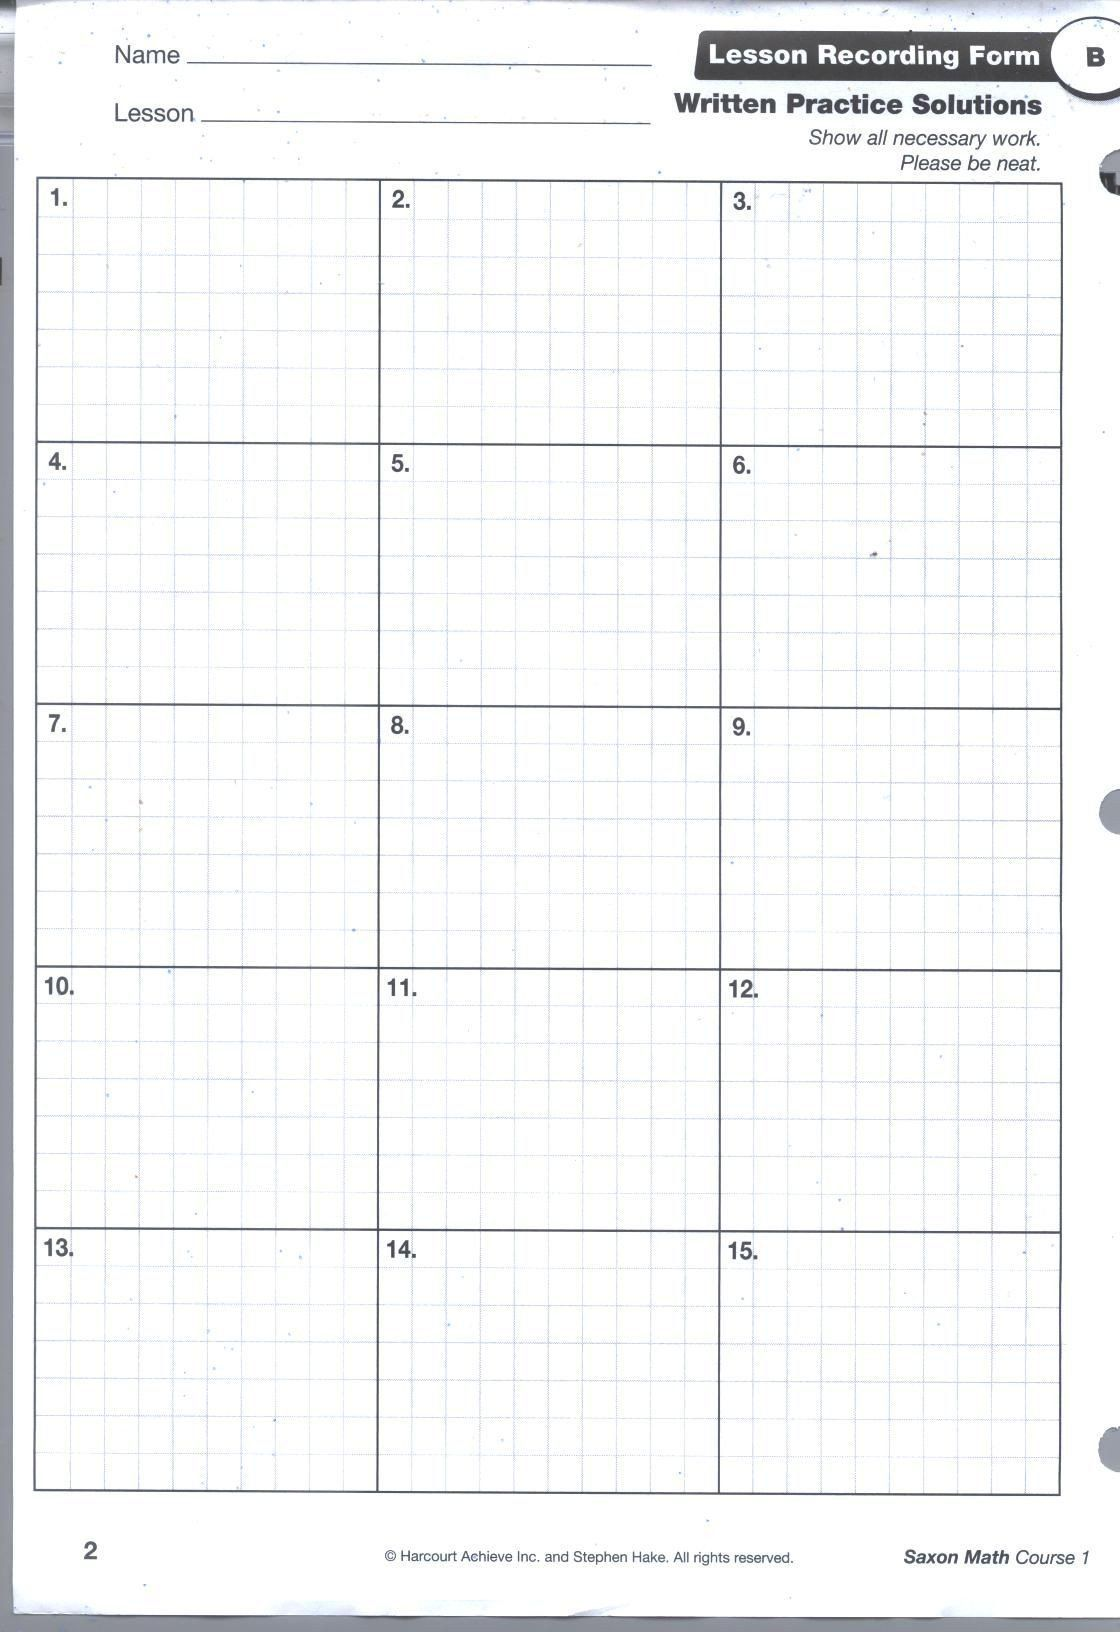 Saxon Math Worksheets 4th Grade Idea By Janice Austin On Education In 2020 Saxon Math Math Printables In 2021 Saxon Math Math Printables Free Printable Math Worksheets [ 1632 x 1120 Pixel ]